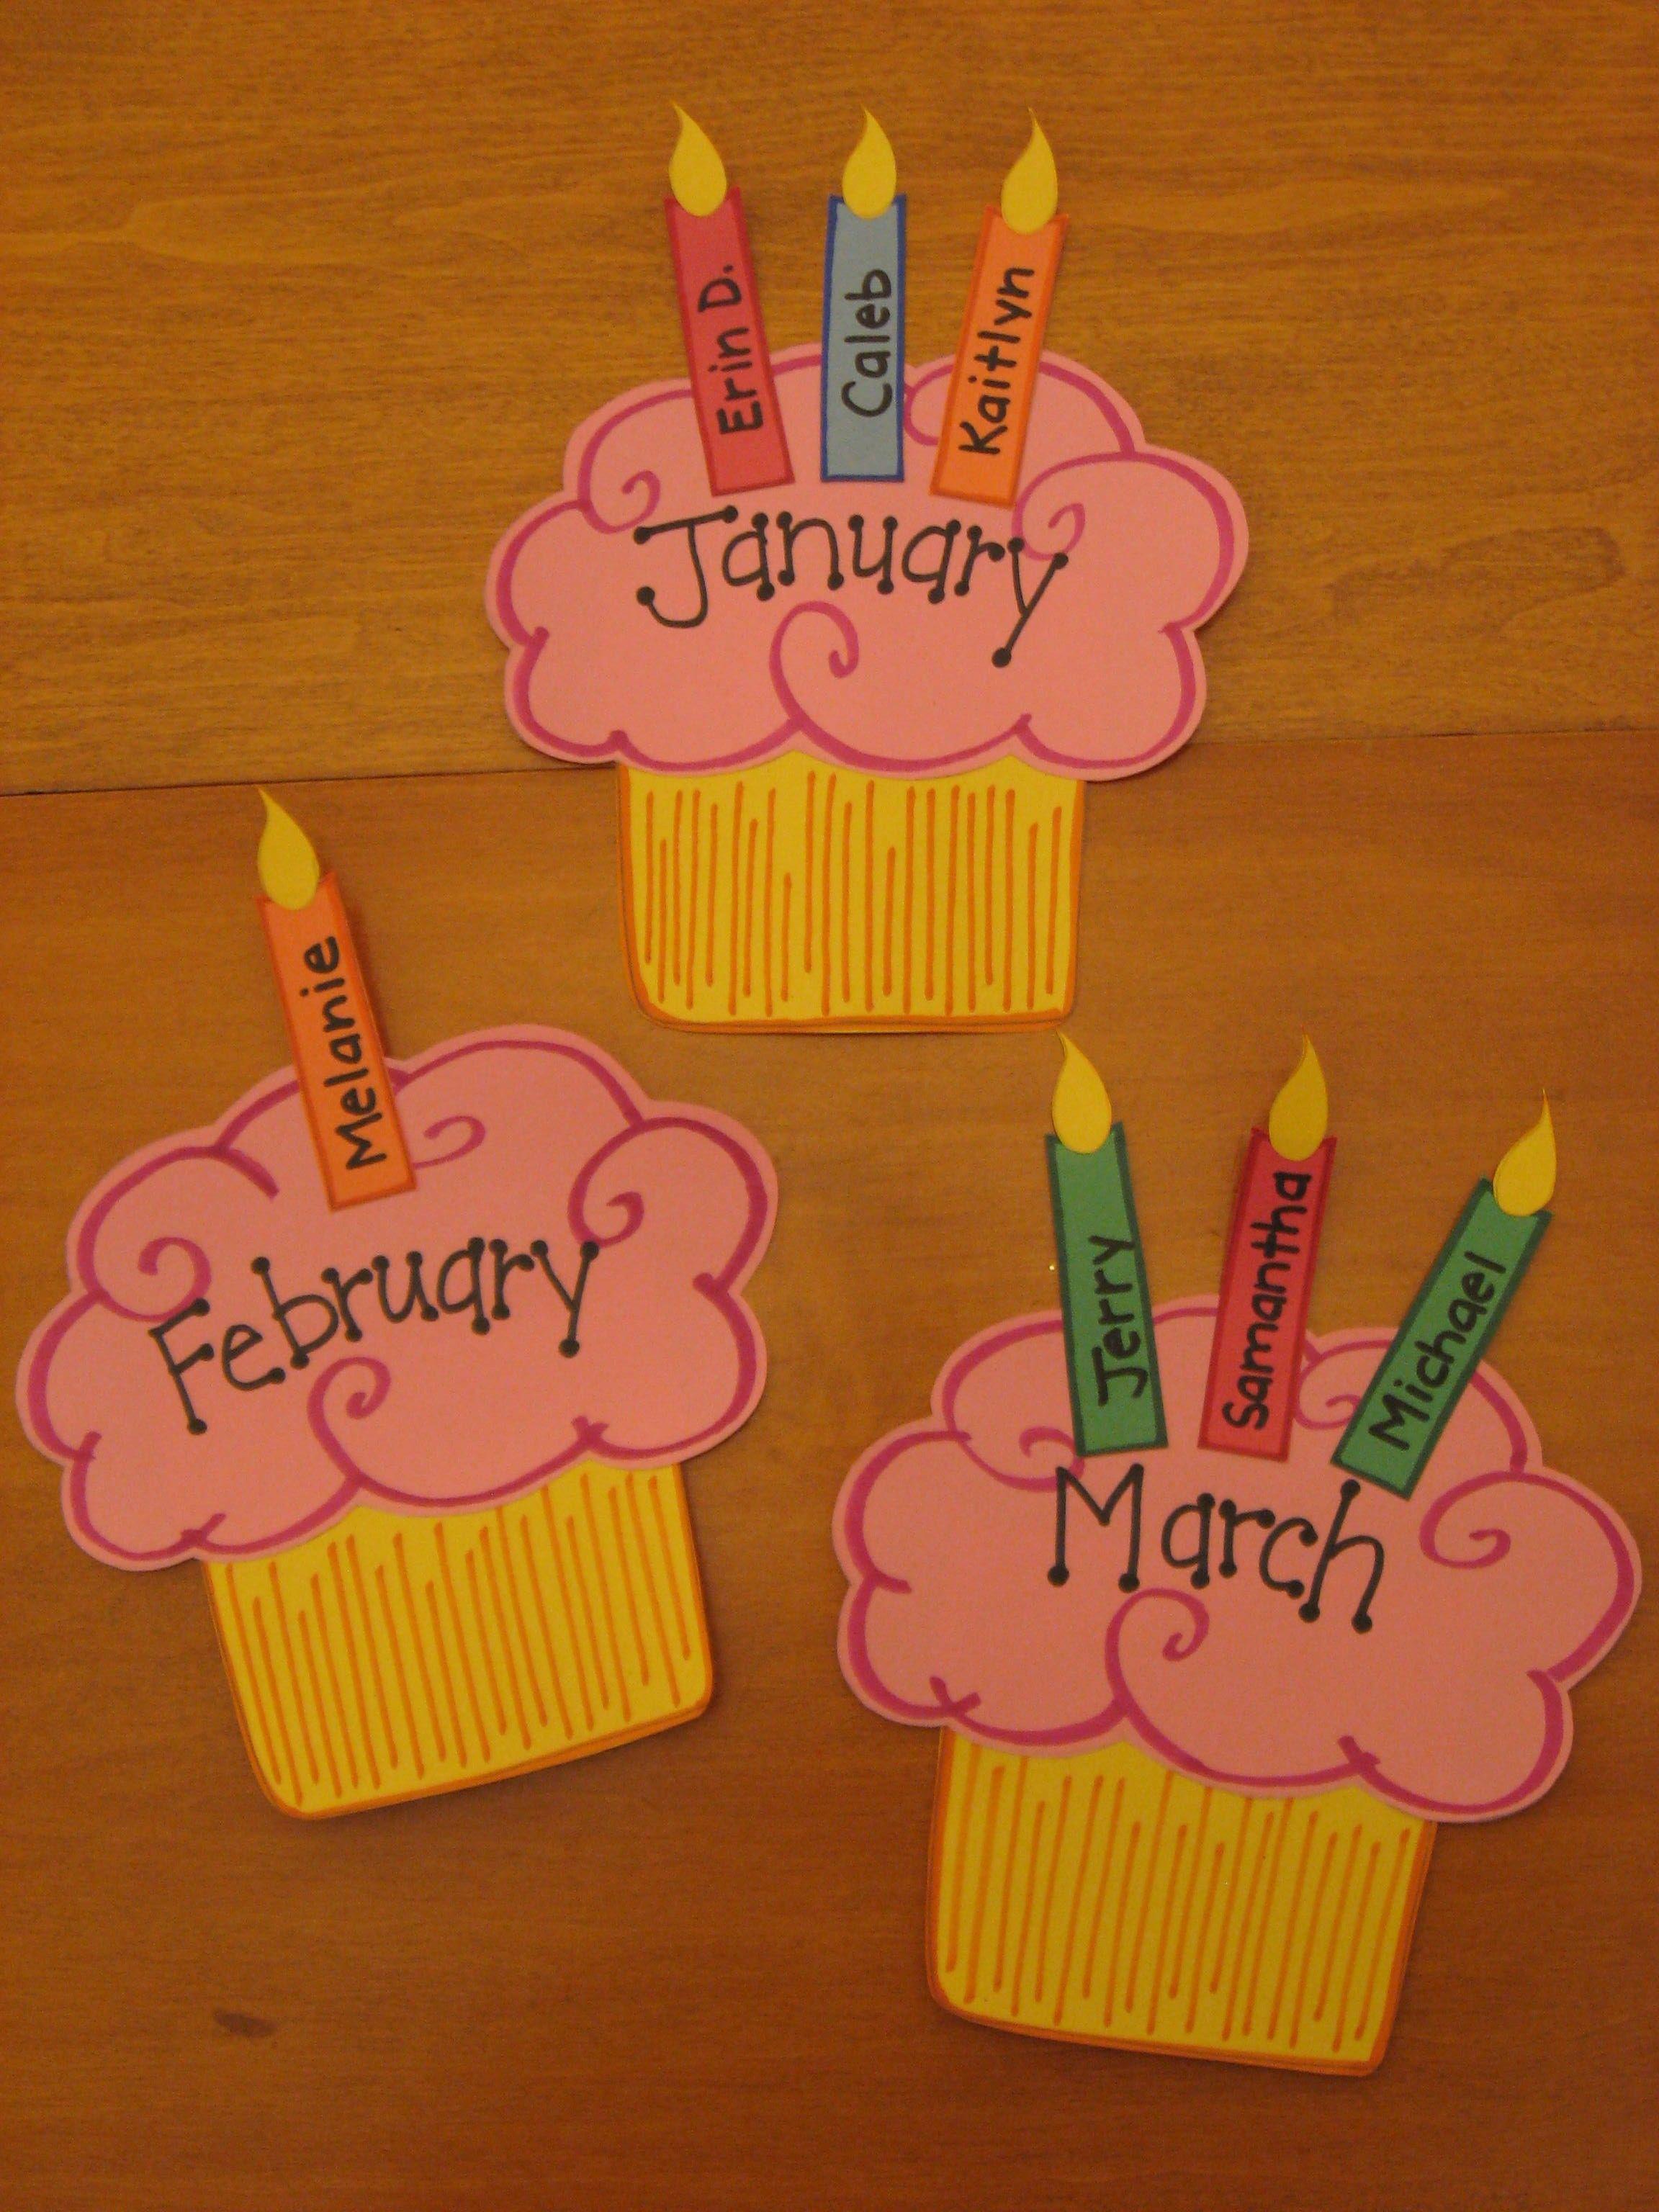 Cupcake Birthday Wall Preschool & Kindergarten Bulletin intended for Birthday Display Cupcakes